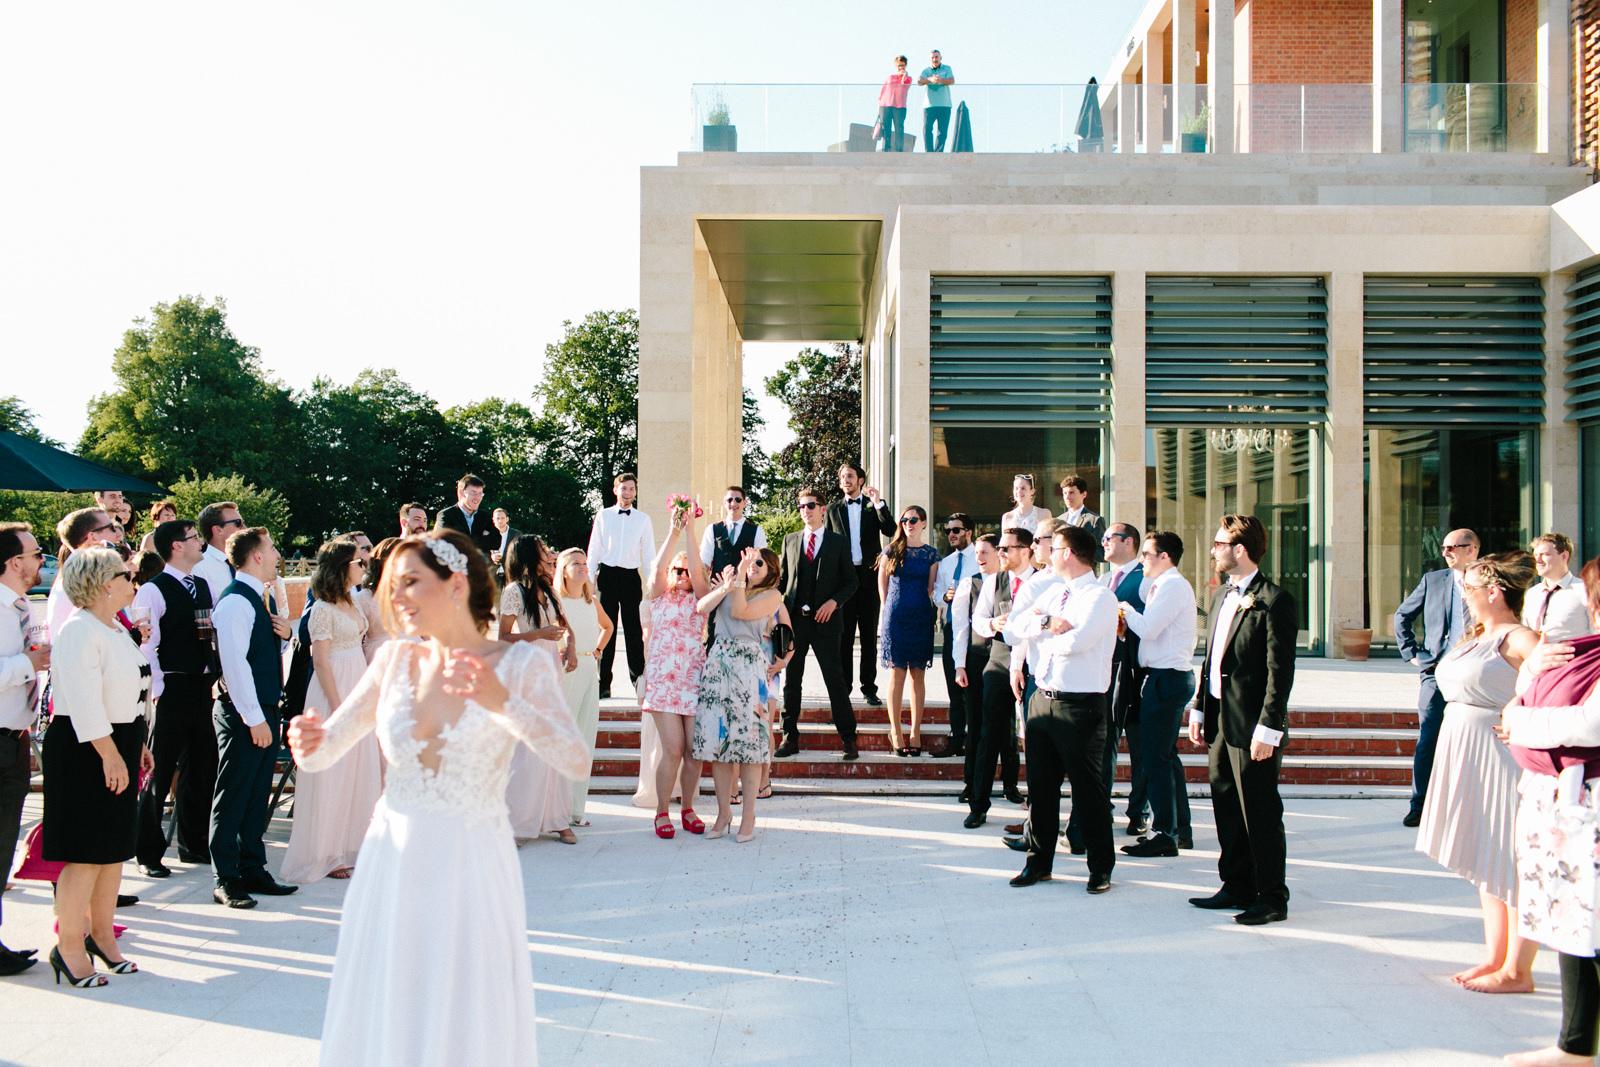 Stanbrooke Abbey Wedding Photographer-322617.jpg